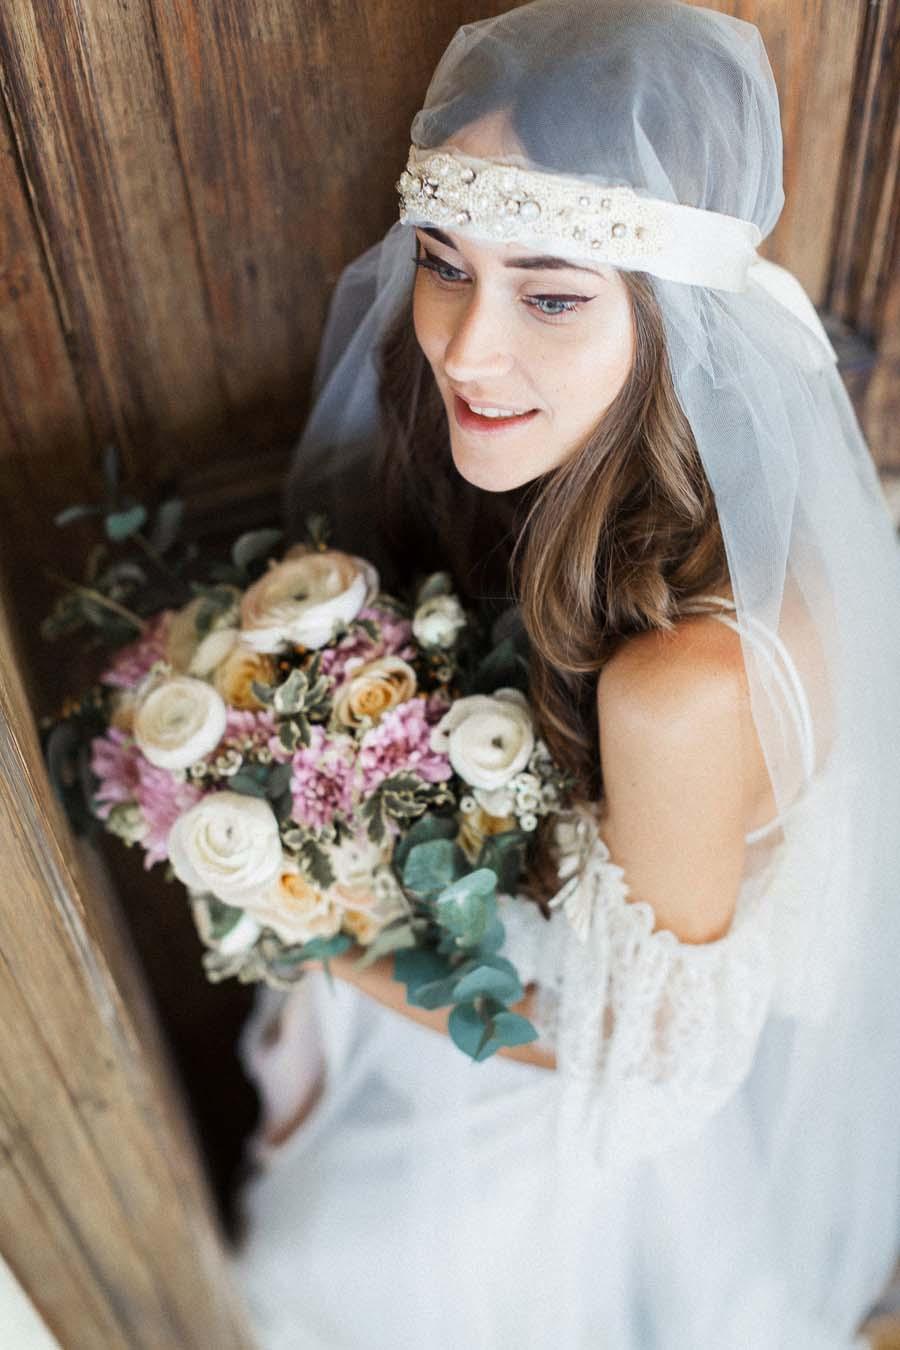 Wedding Dresses for 2017: Flowers of the Valley by Katya Katya Shehurina